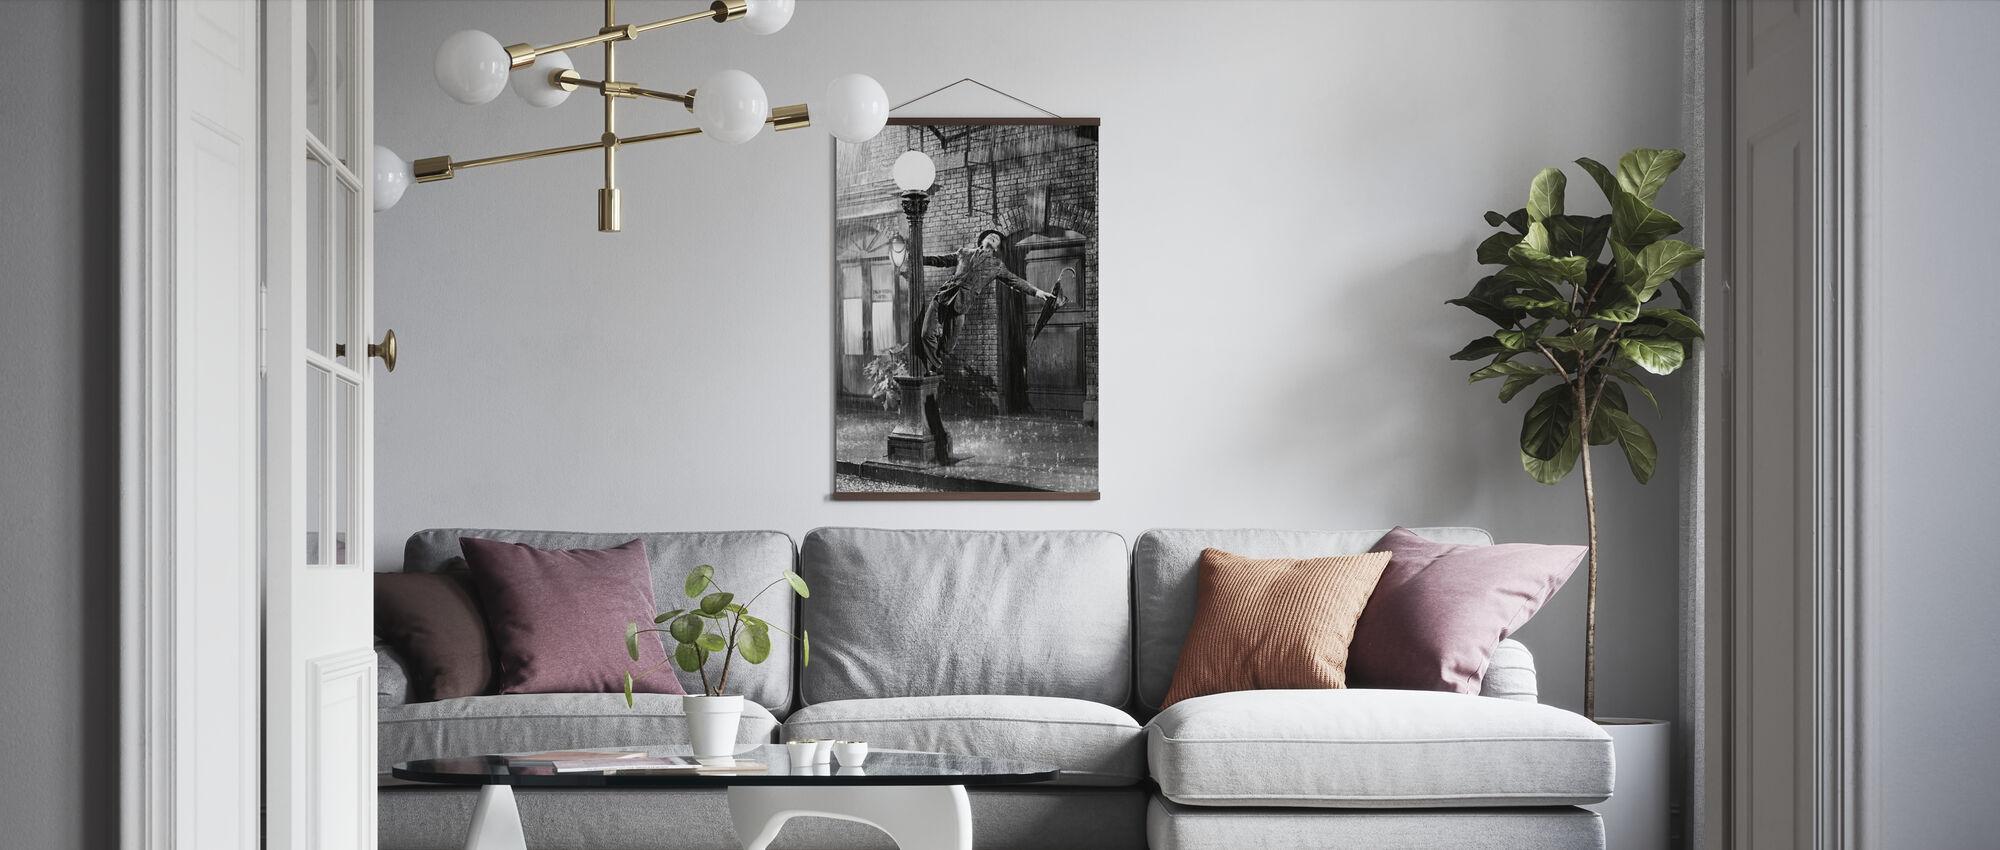 Singing - Gene Kelly - Poster - Living Room